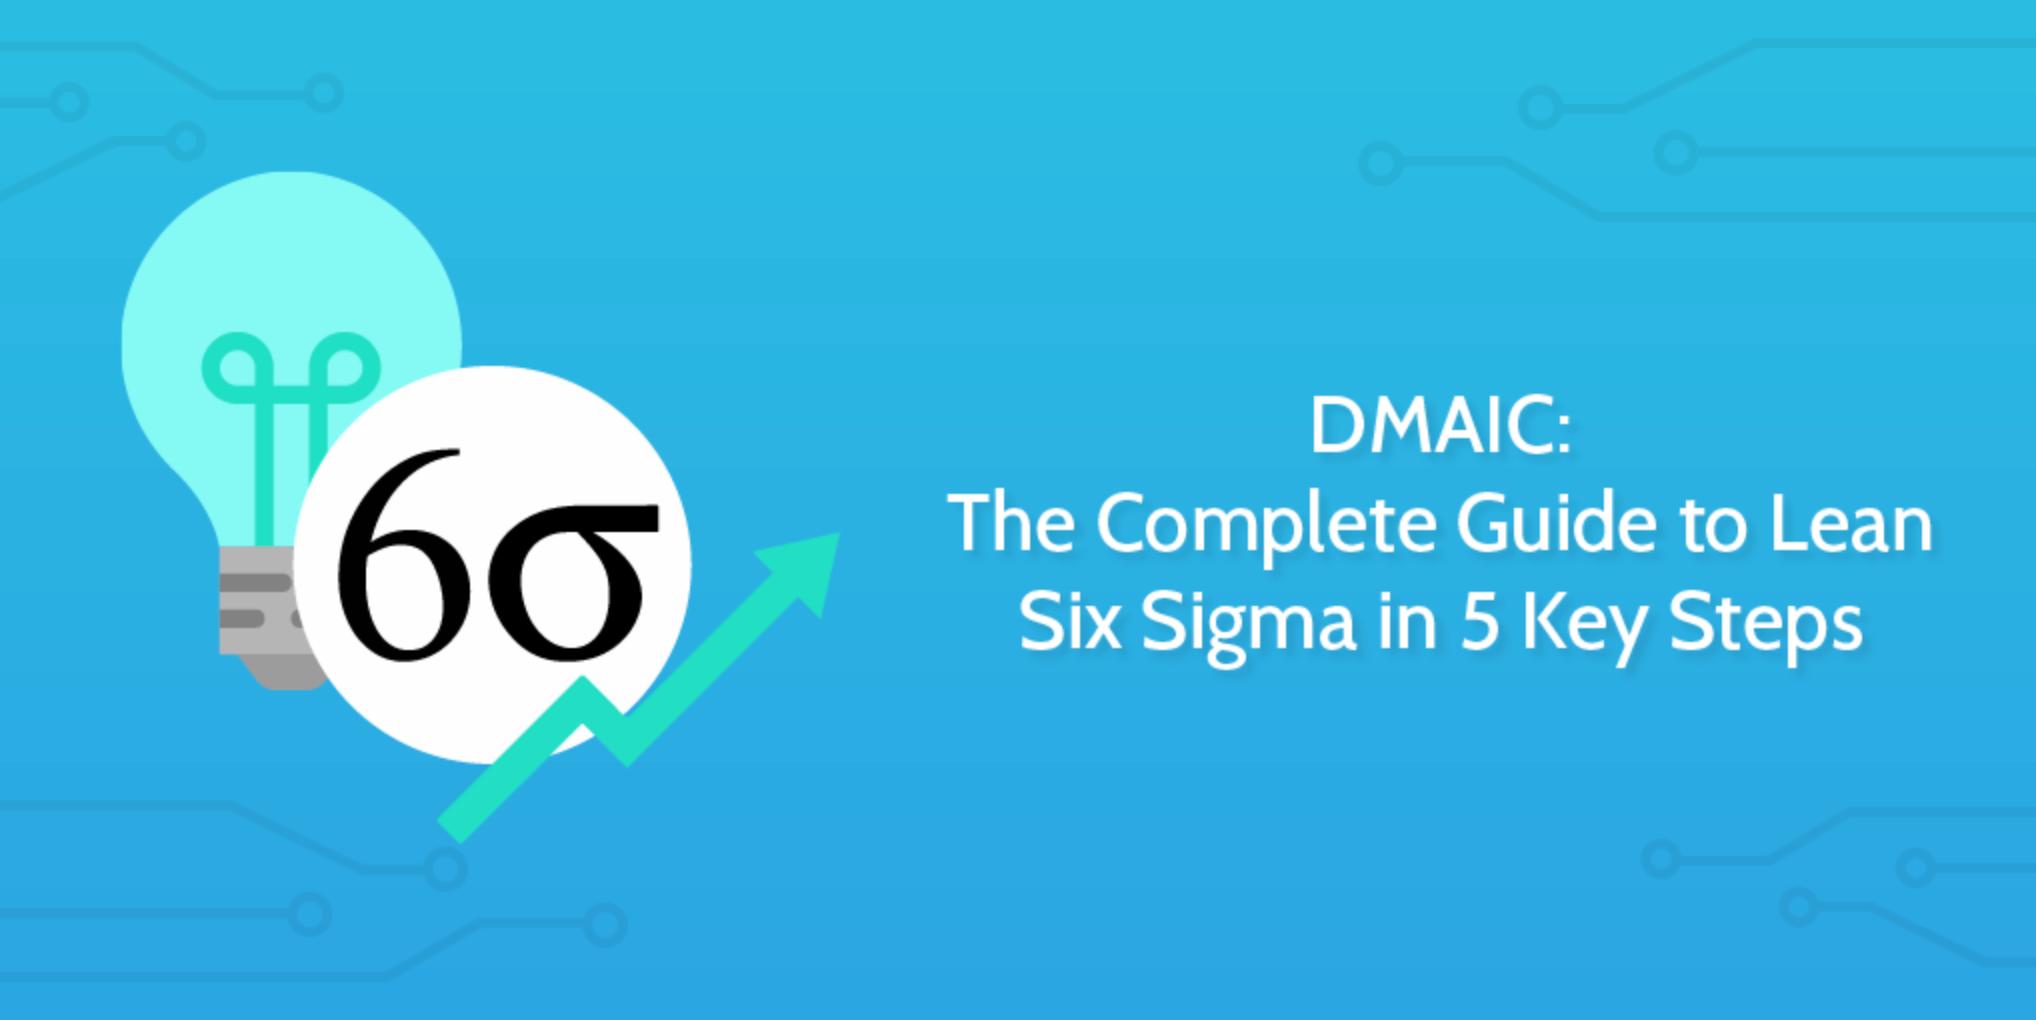 process optimization dmaic